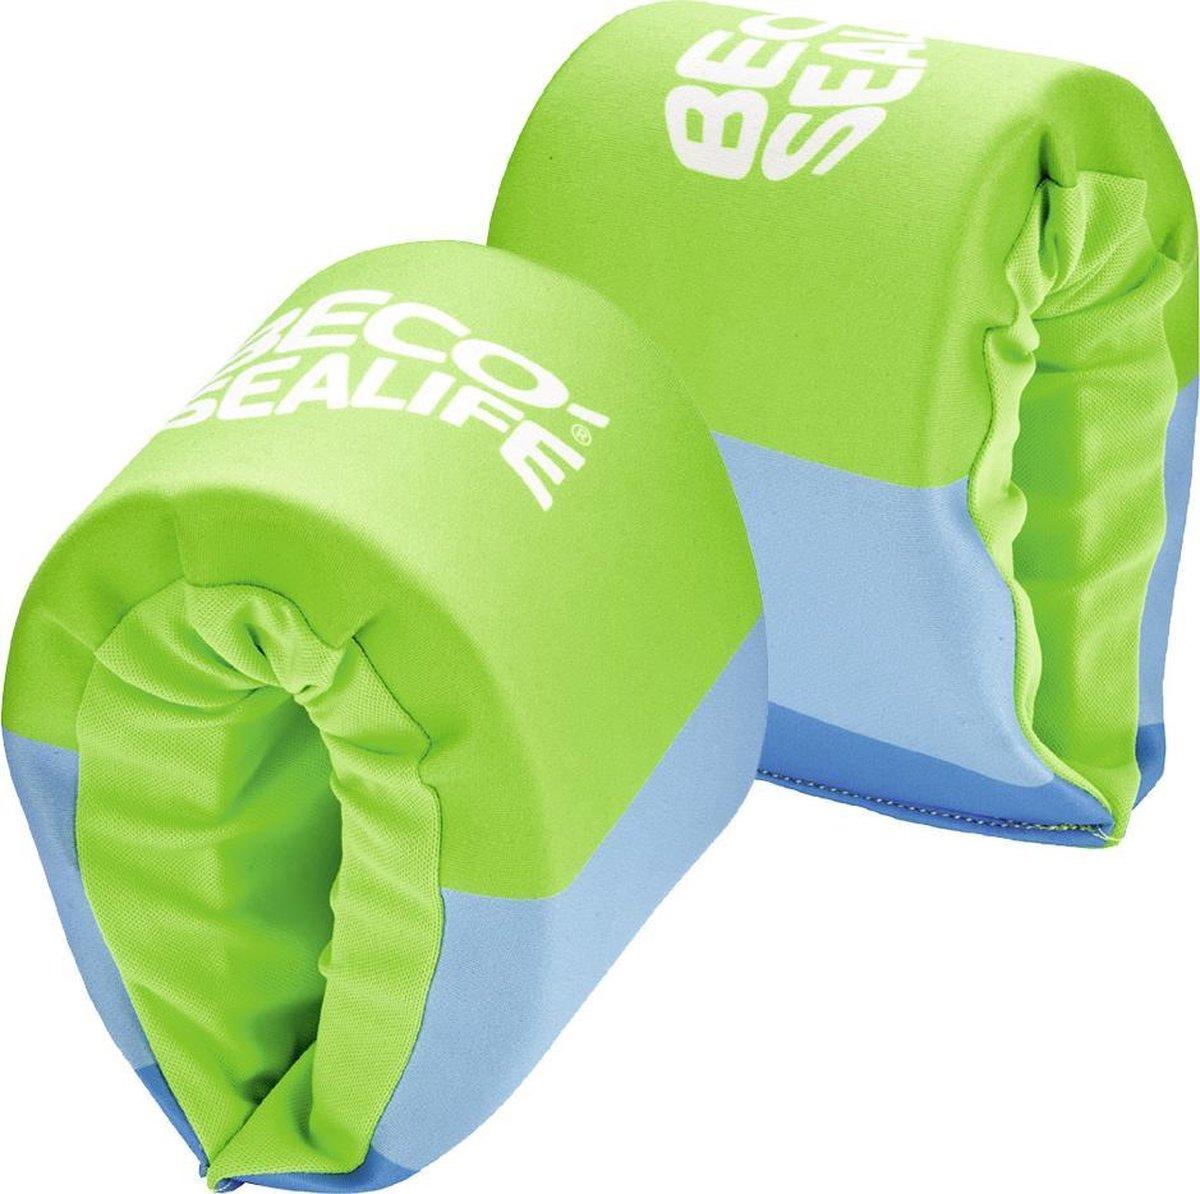 BECO-SEALIFE zwembandjes, neopreen zwembandjes, 15-30 kg, groen